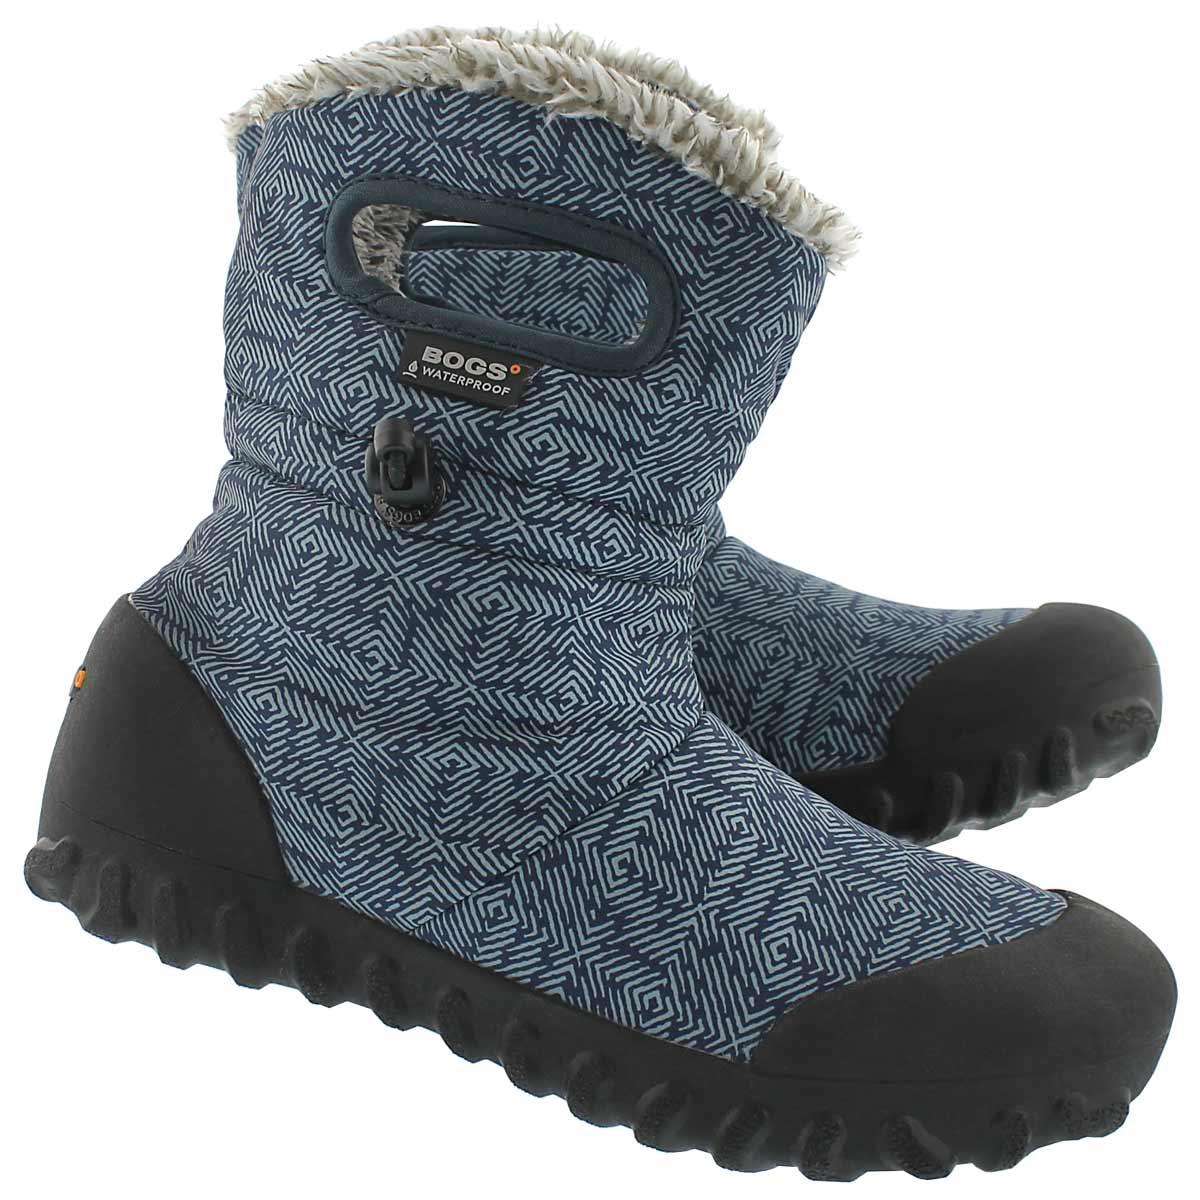 Lds B-Moc Dash Puff blue wtpf boot